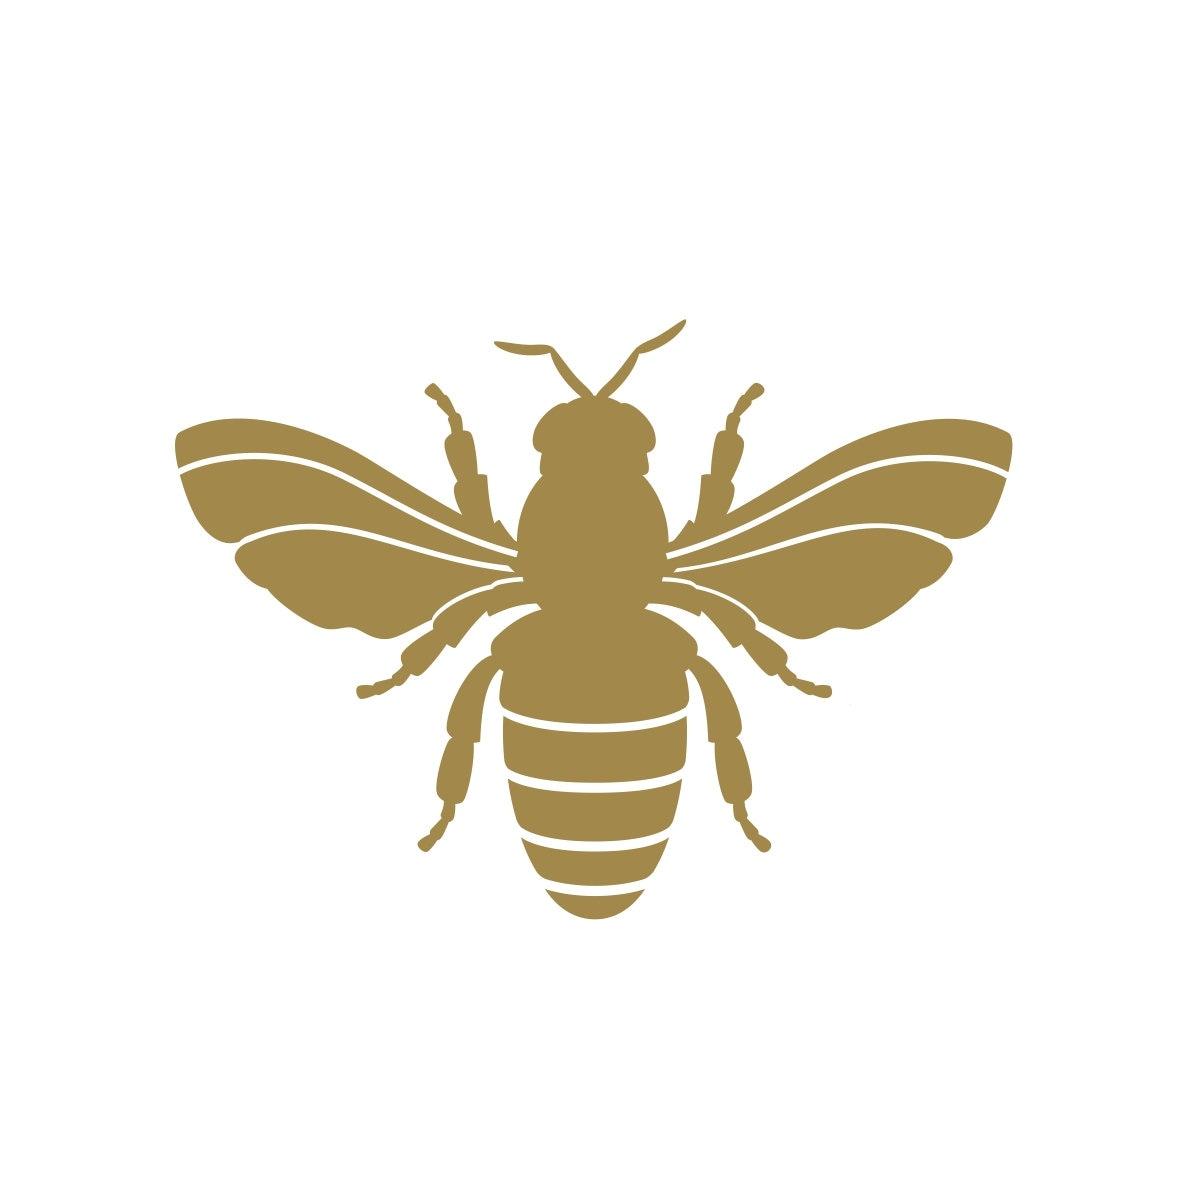 Bee Decal Gold Bee Napoleonic Bee Decal Set Bee Decor